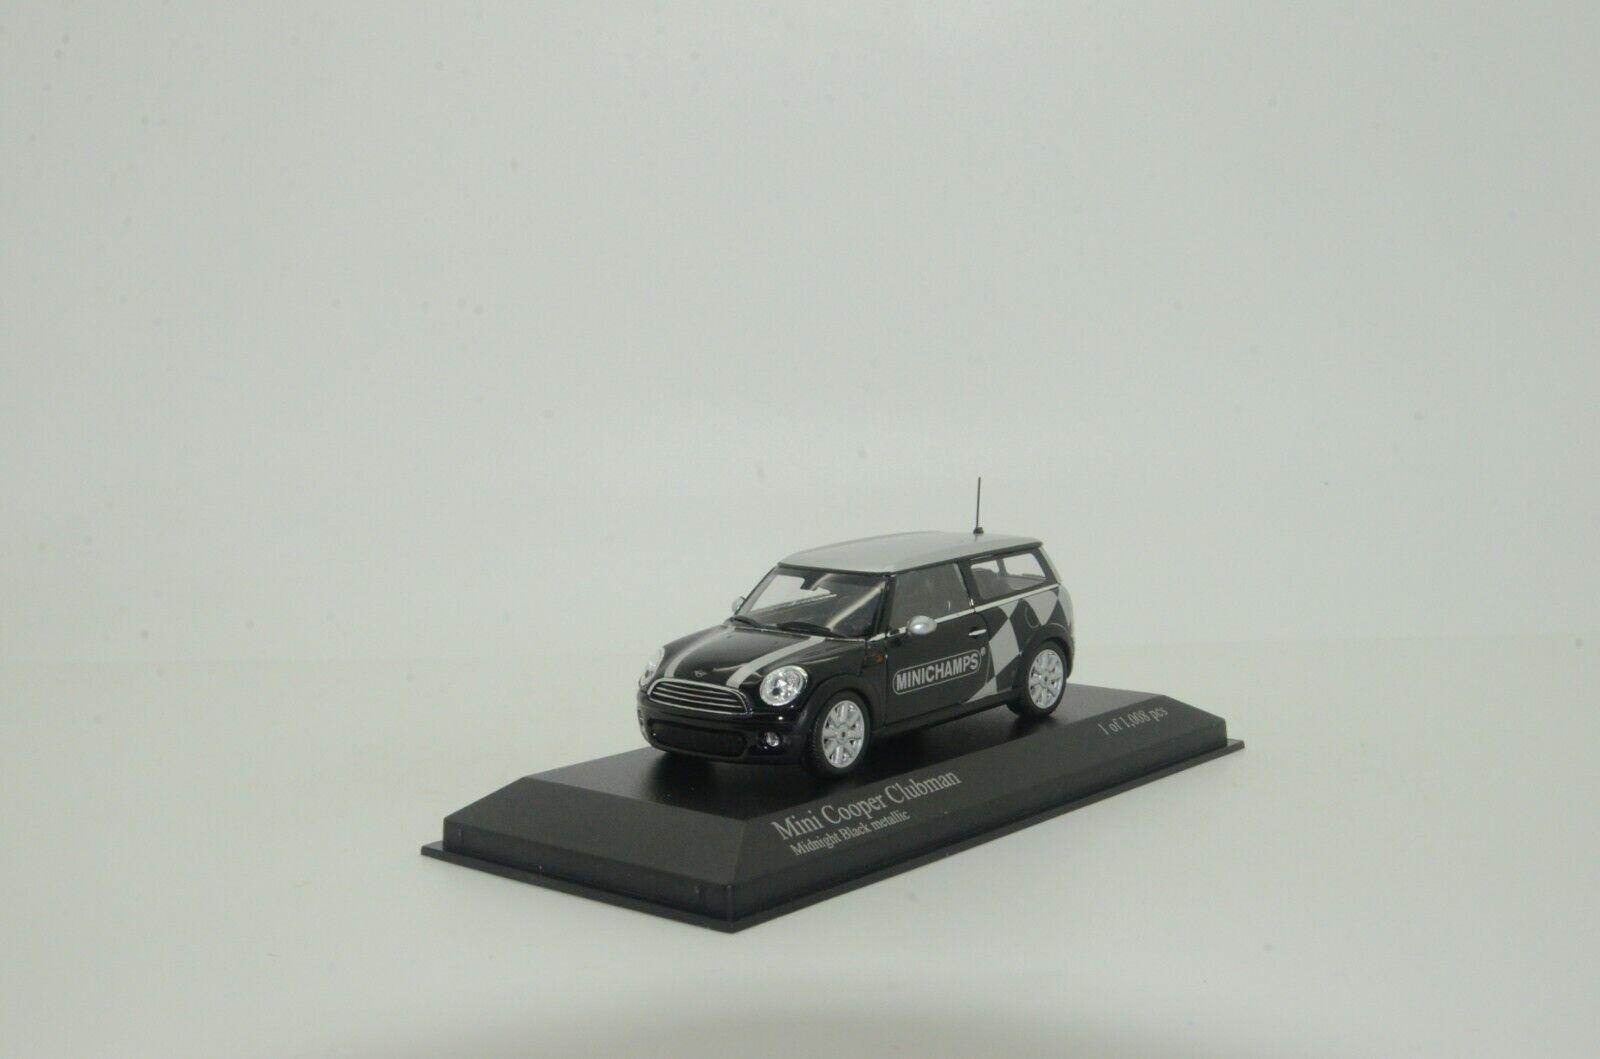 Mini Cooper Clubman 2007 negrometallice Minichamps 138672 1 43